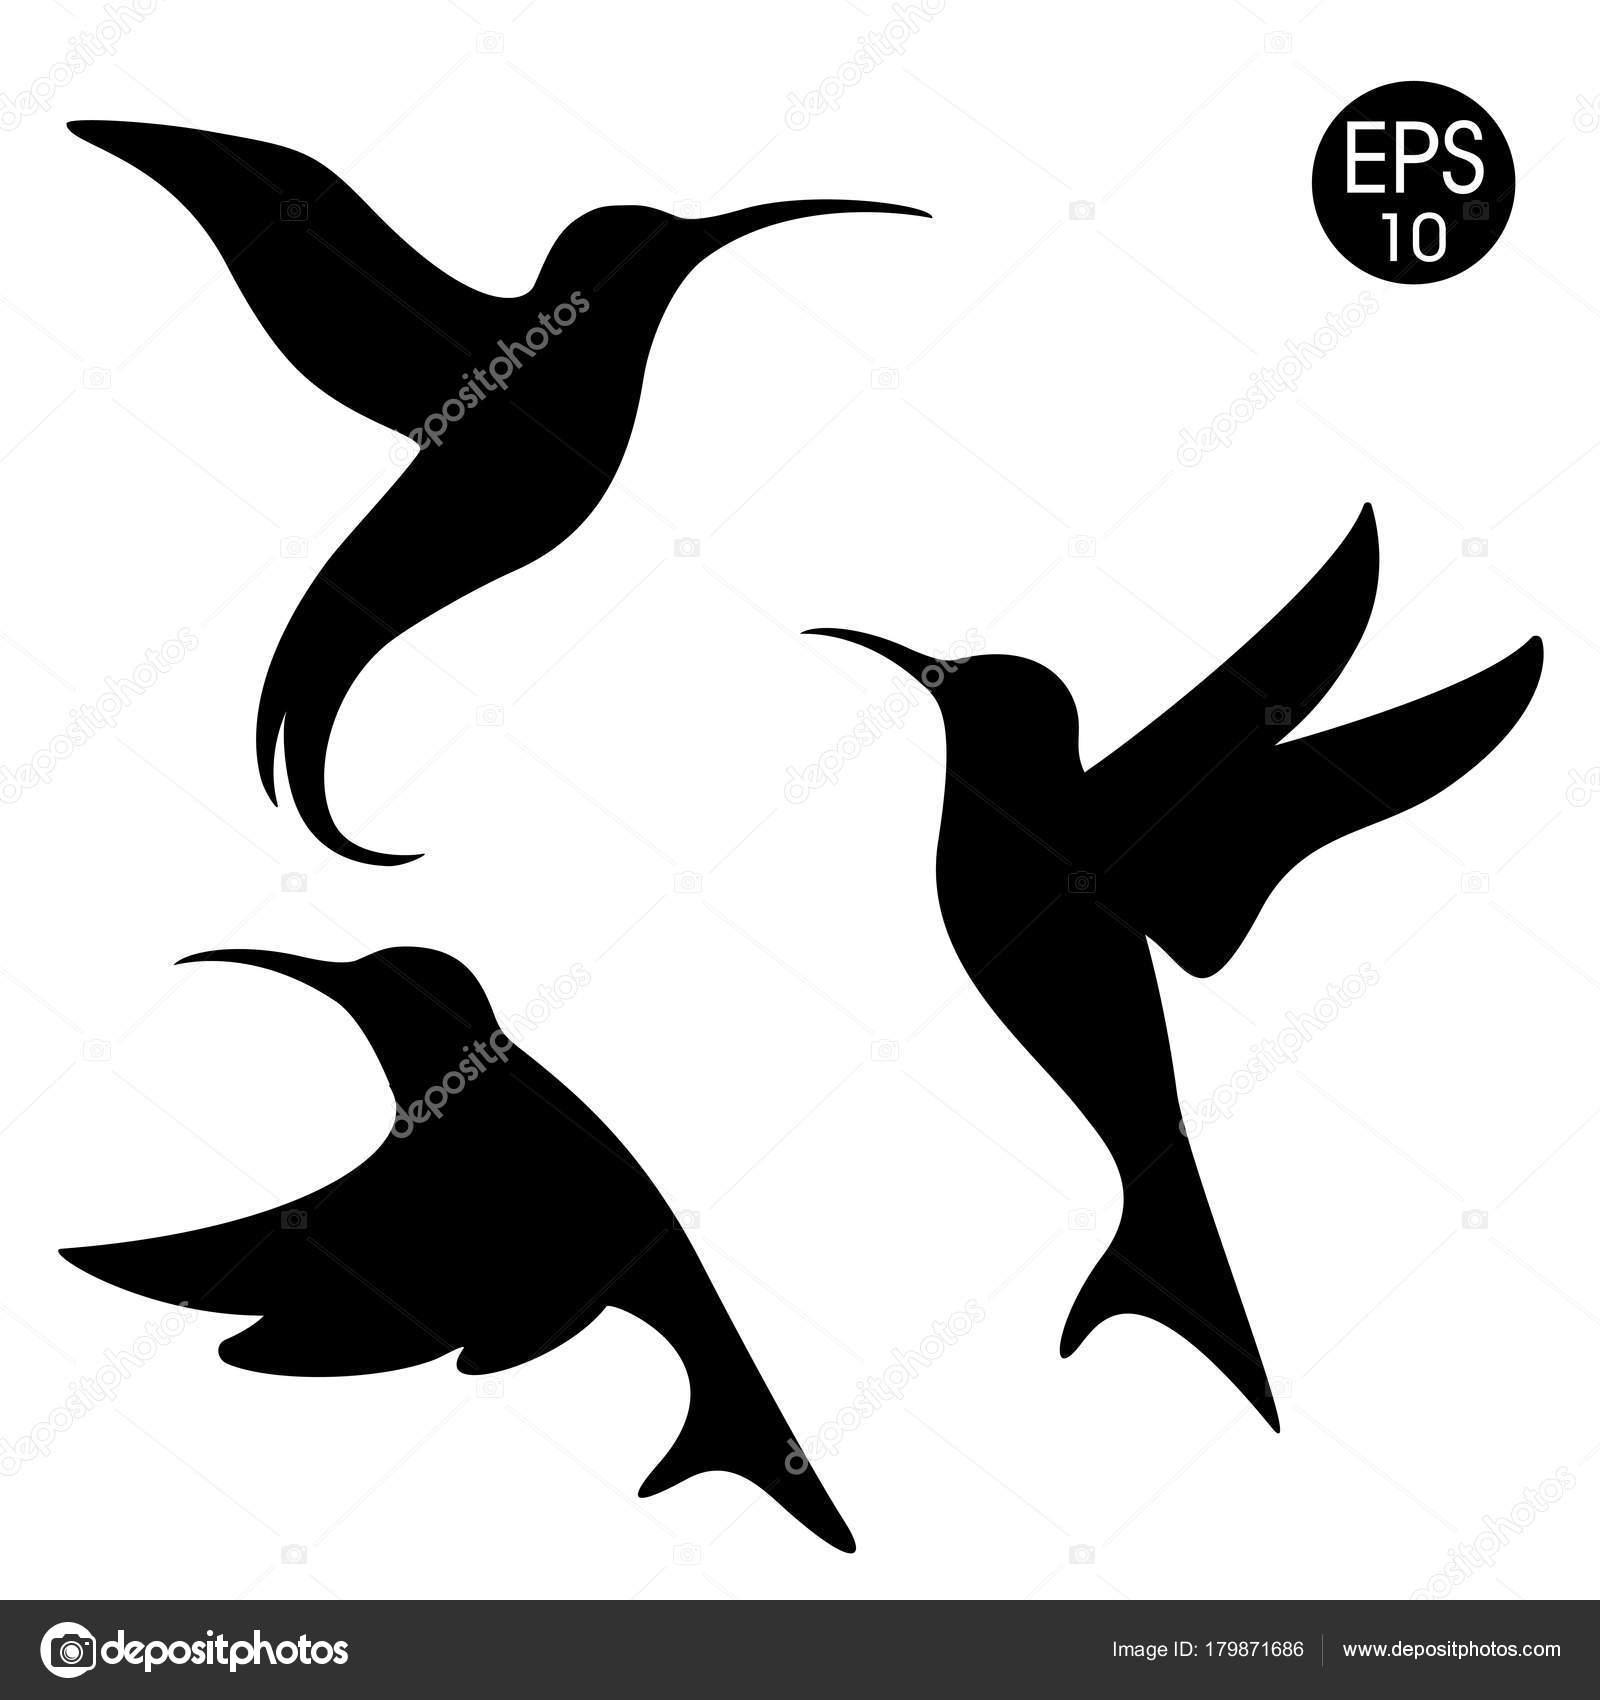 Fotos Colibri Silueta Silueta De Colibri Negro Vector Pájaros En